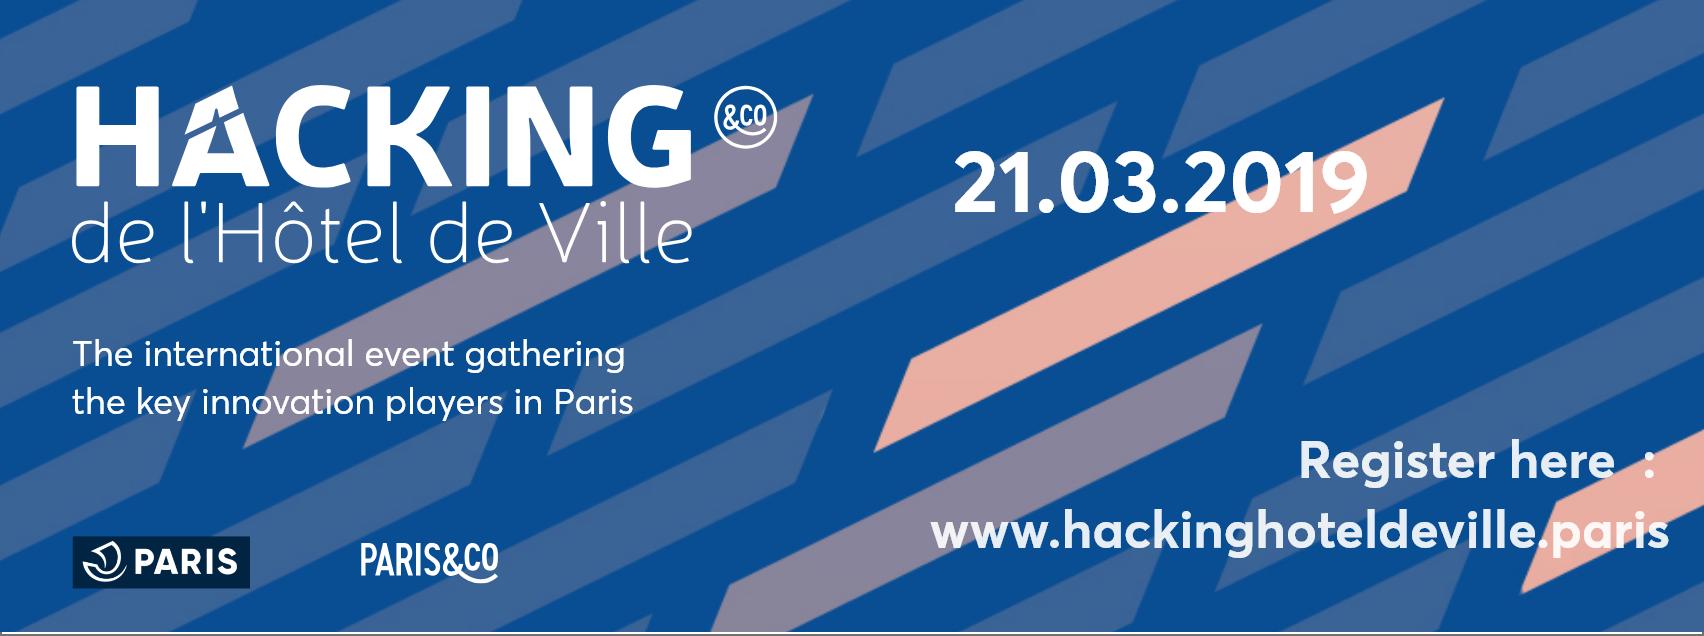 VOGO at Hacking Paris 2019